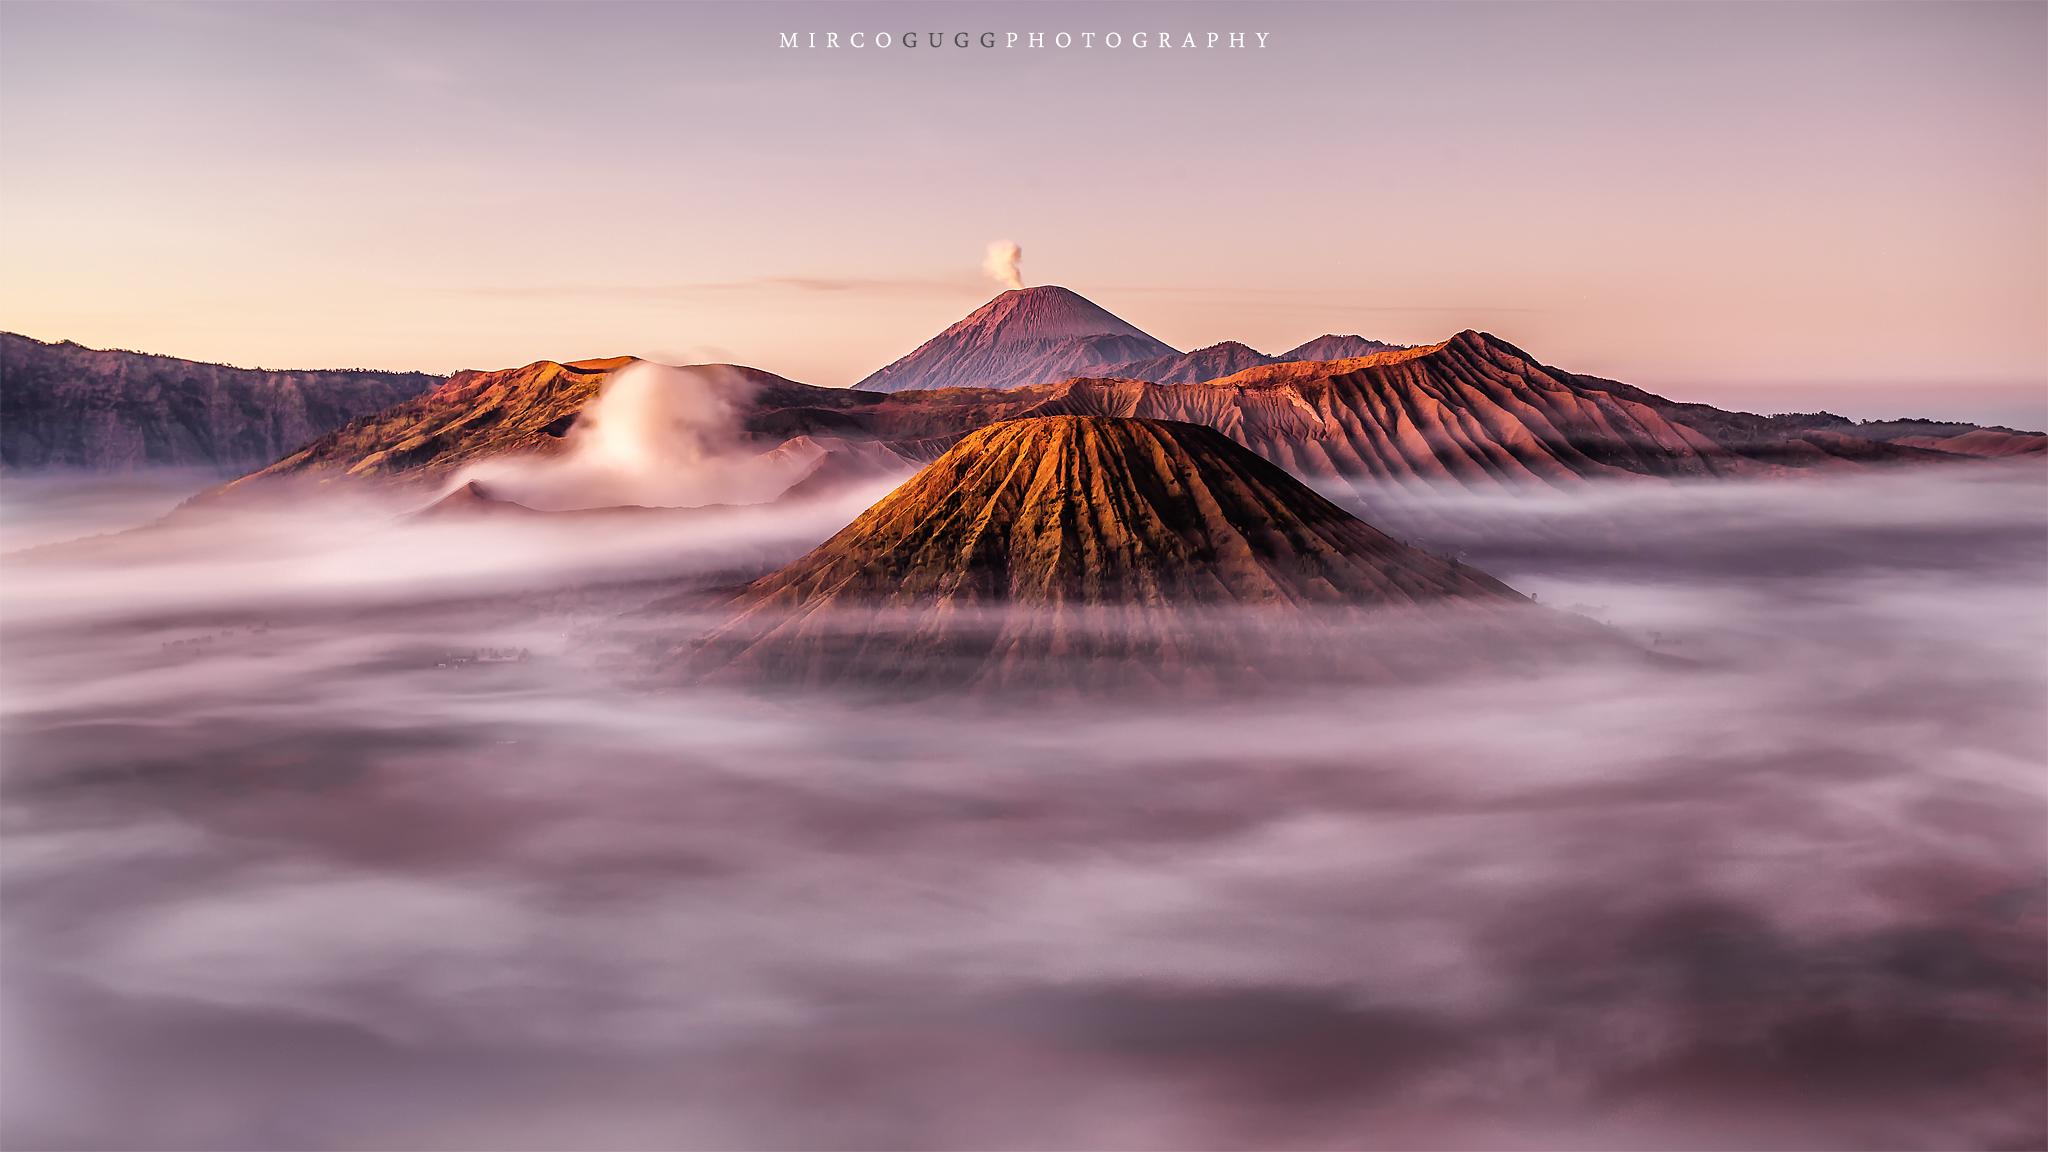 Bromo-Tengger-Semeru National Park, Indonesia